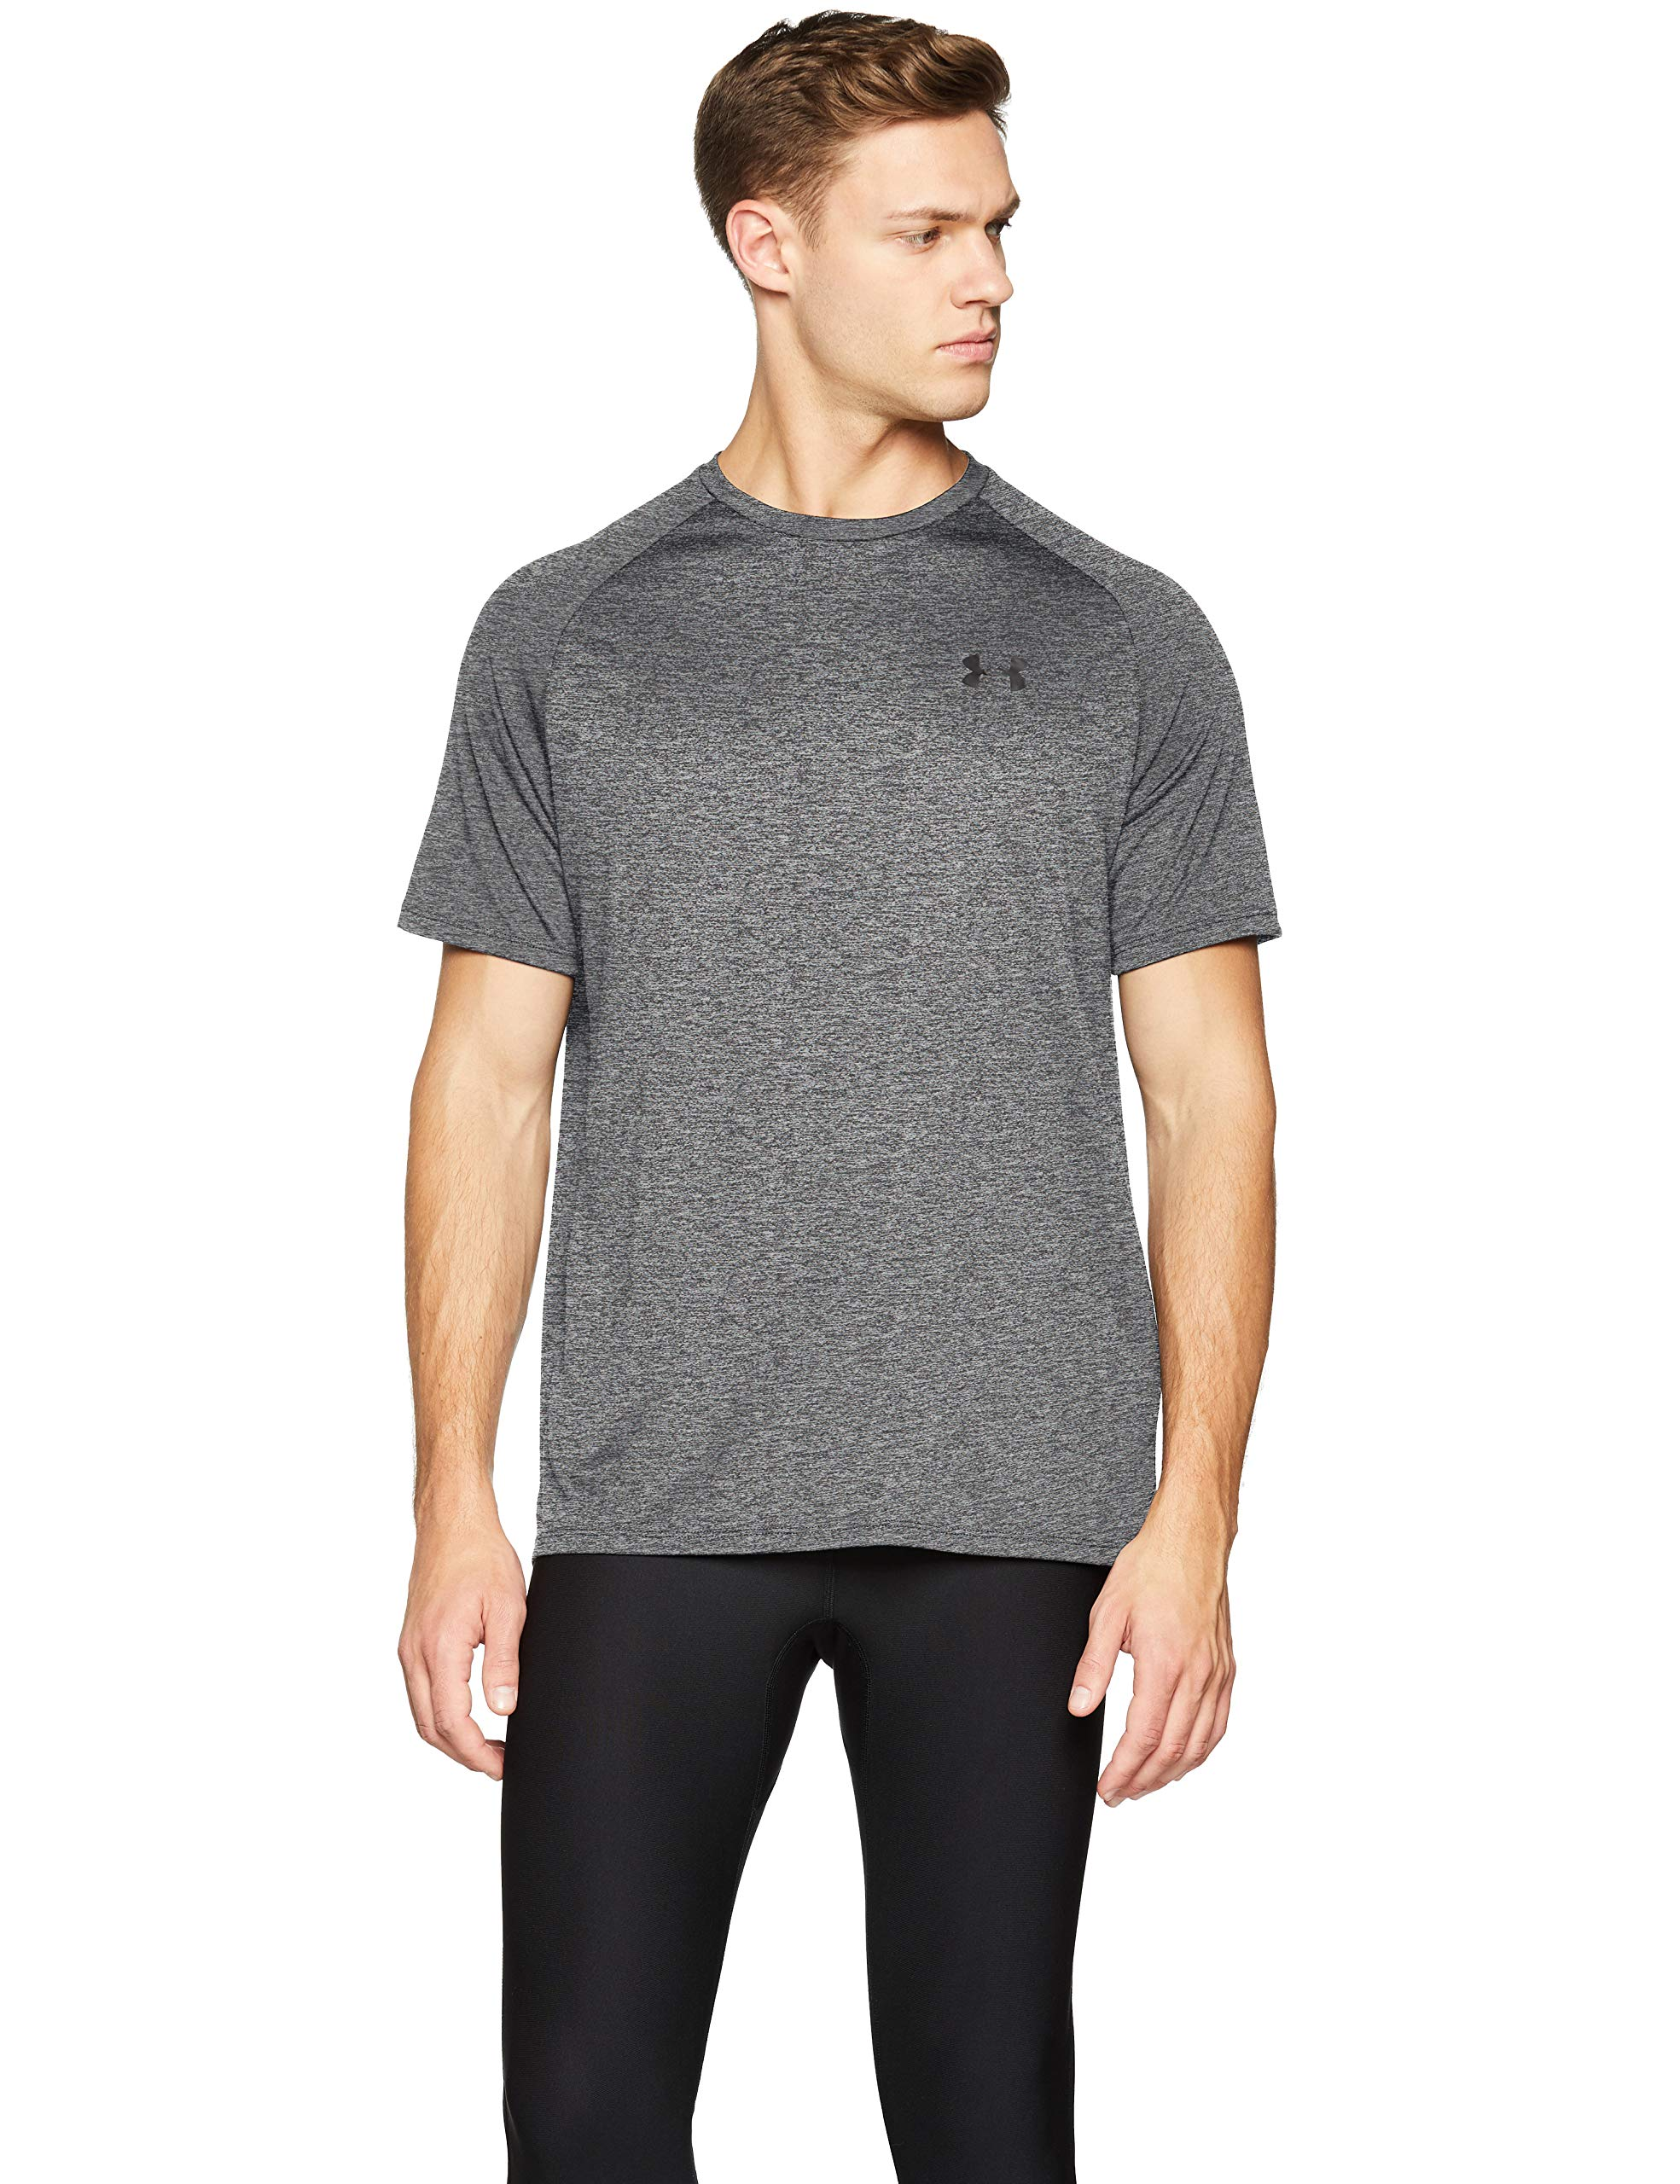 Under Armour Men's Tech 2.0 Short Sleeve T-Shirt, Black (002)/Black, 3X-Large by Under Armour (Image #1)